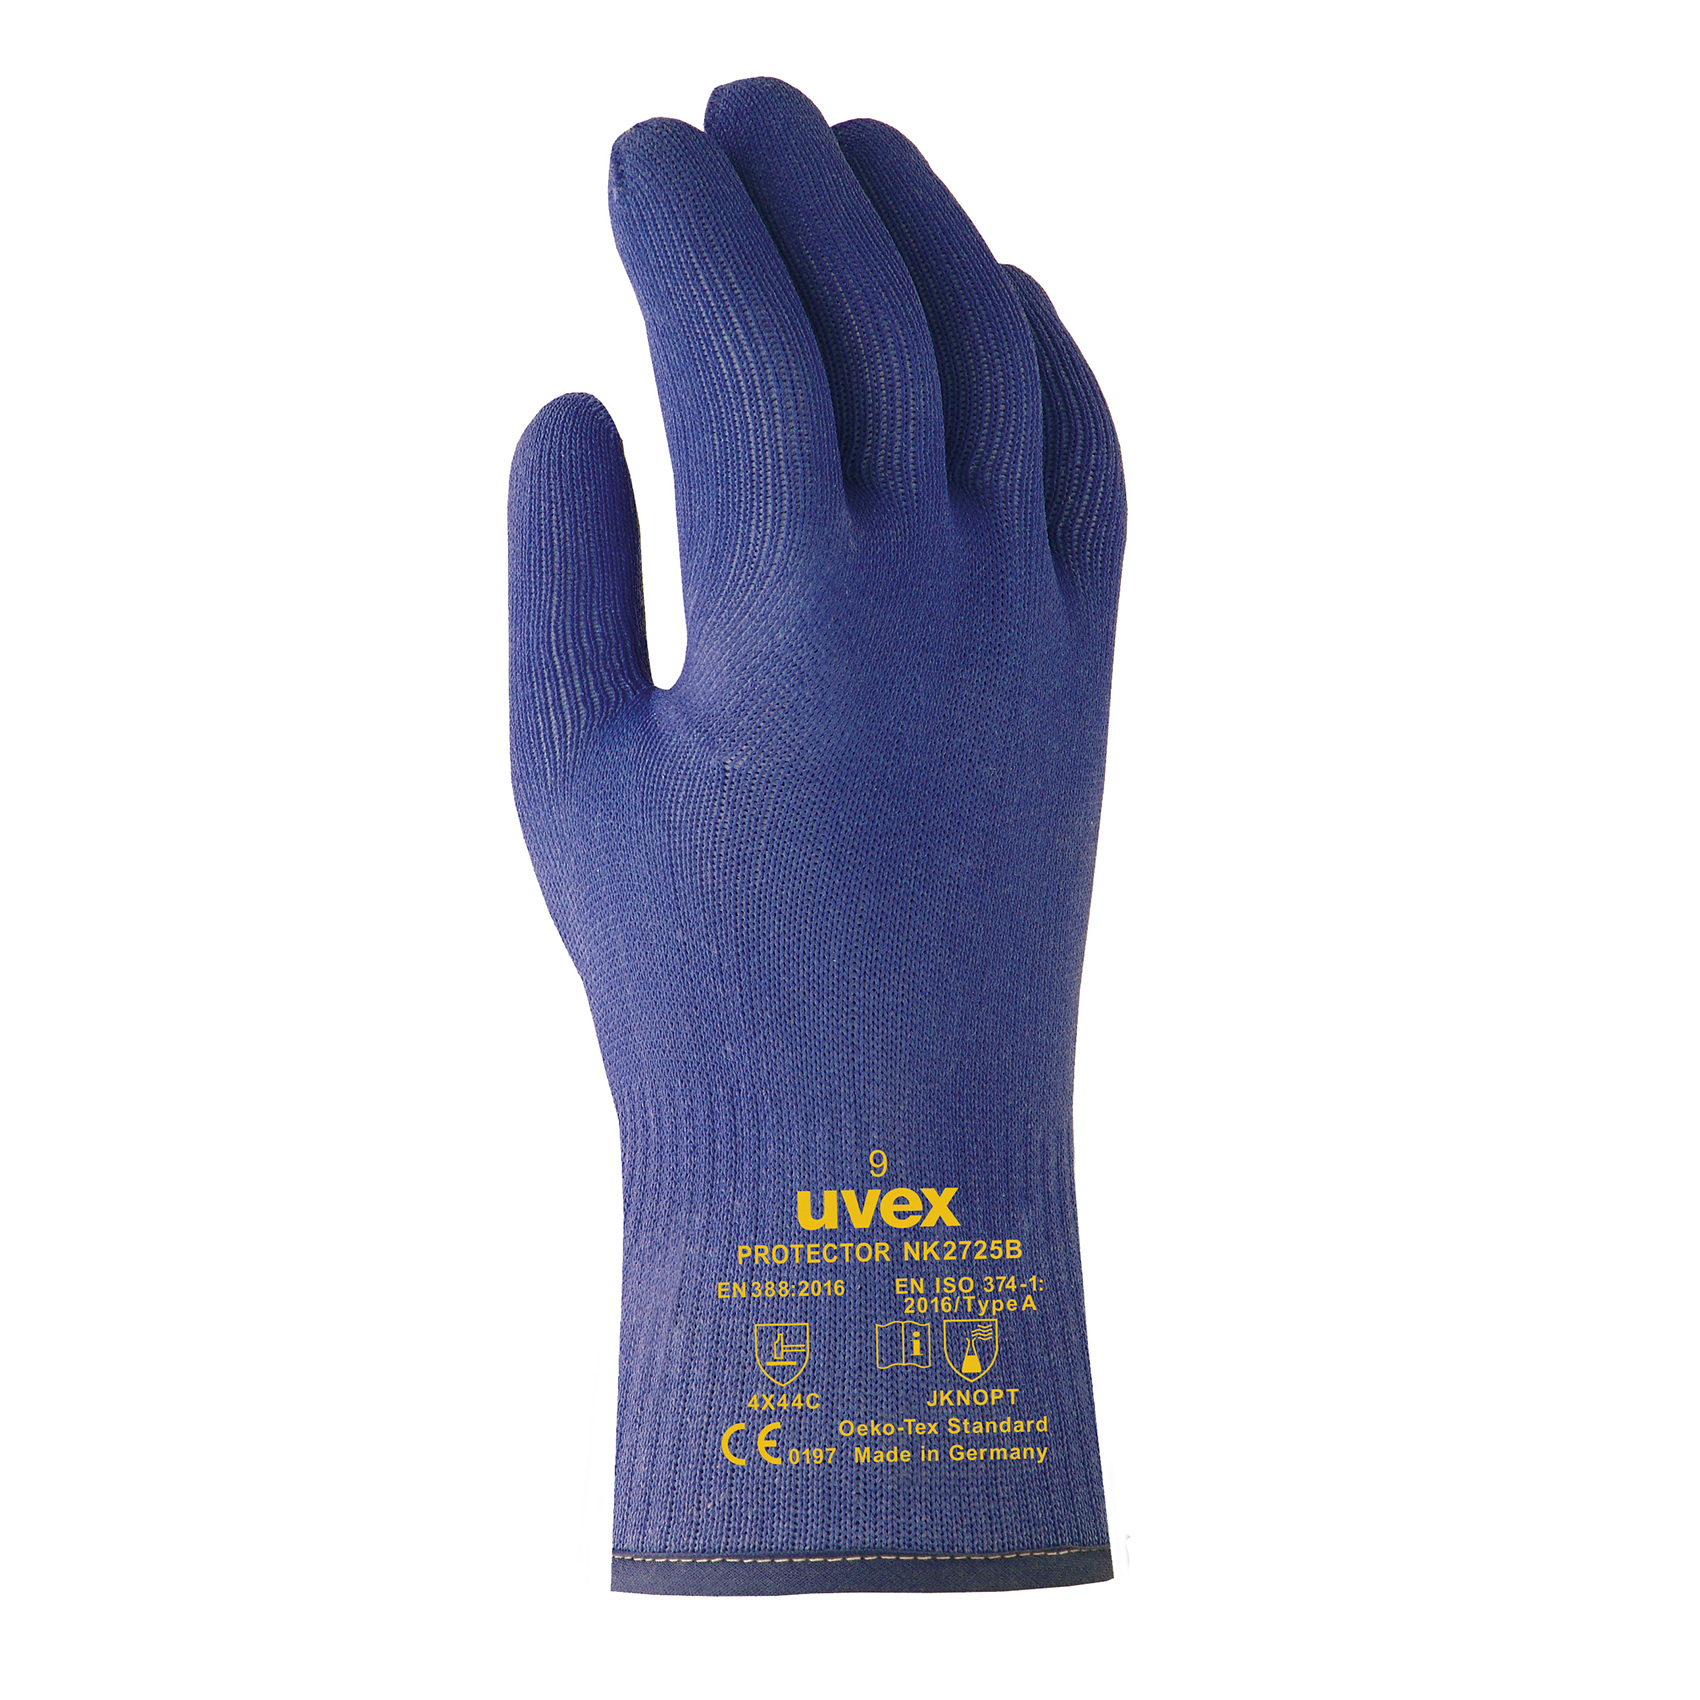 gant de protection contre les produits chimiques uvex protector nk2725b gants de protection. Black Bedroom Furniture Sets. Home Design Ideas